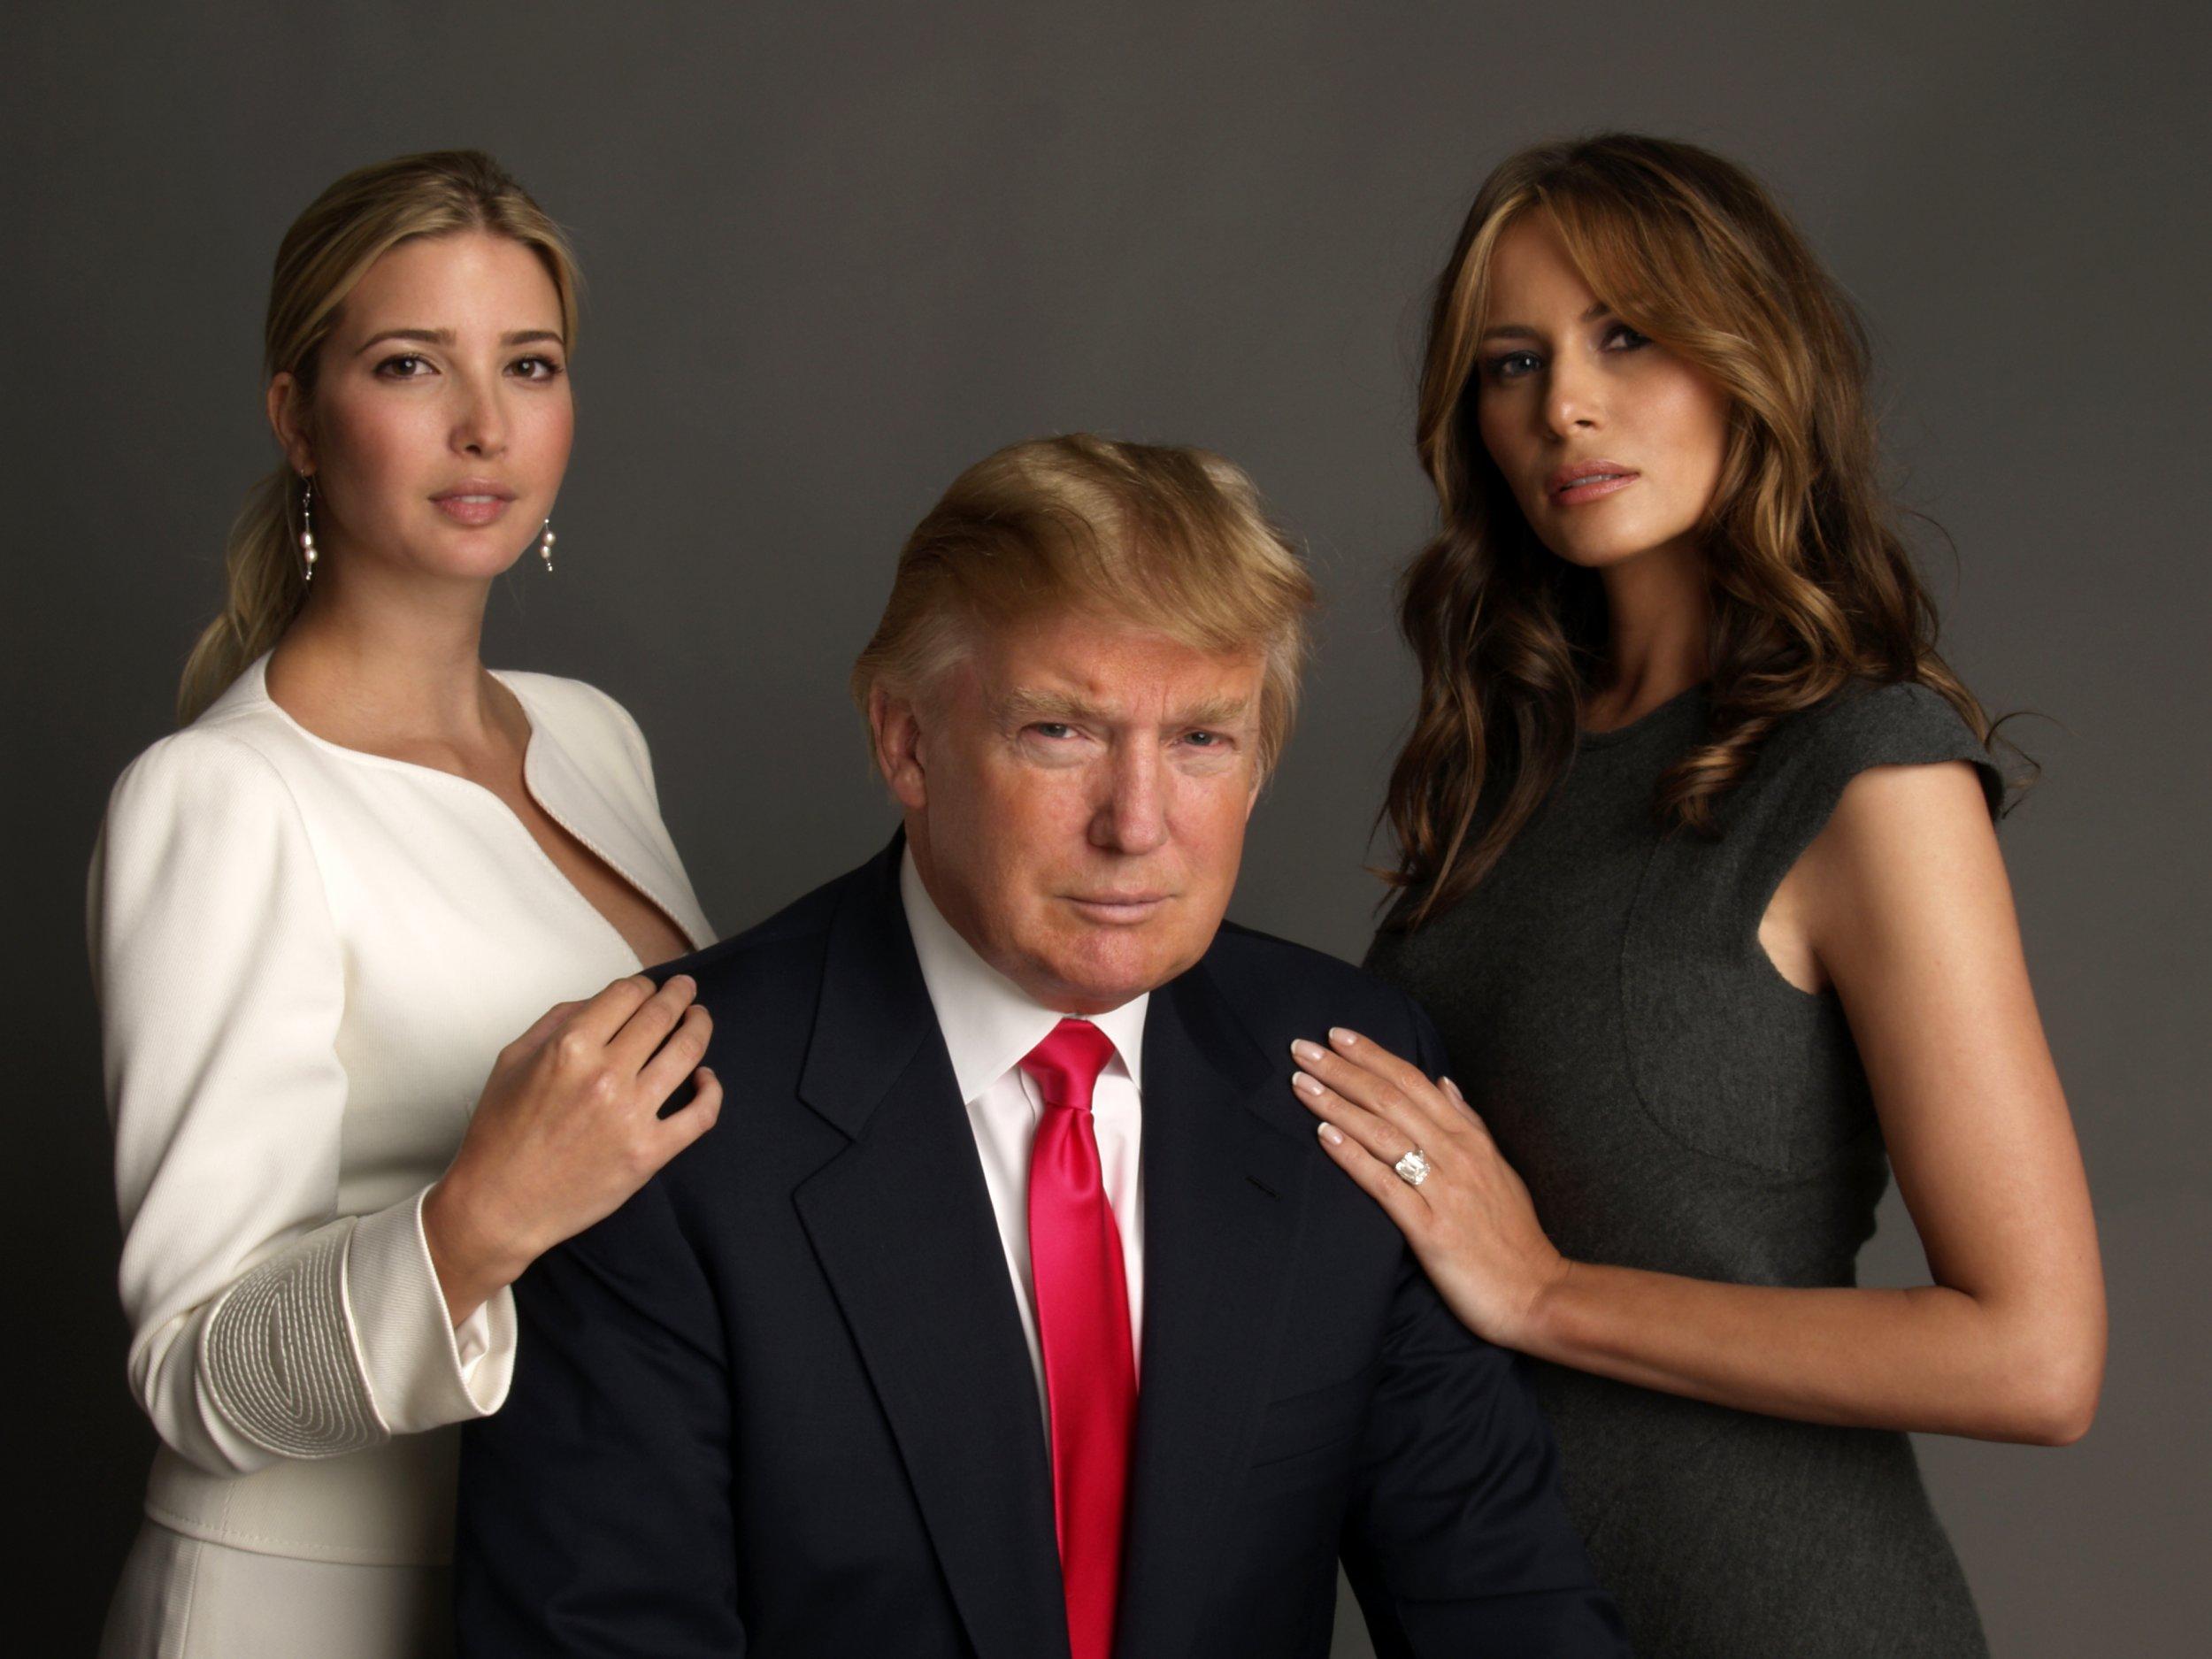 LMAGA DONALD TRUMP W// FIRST LADY MELANIA /& DAUGHTER IVANKA 45TH PRESIDENT PHOTO